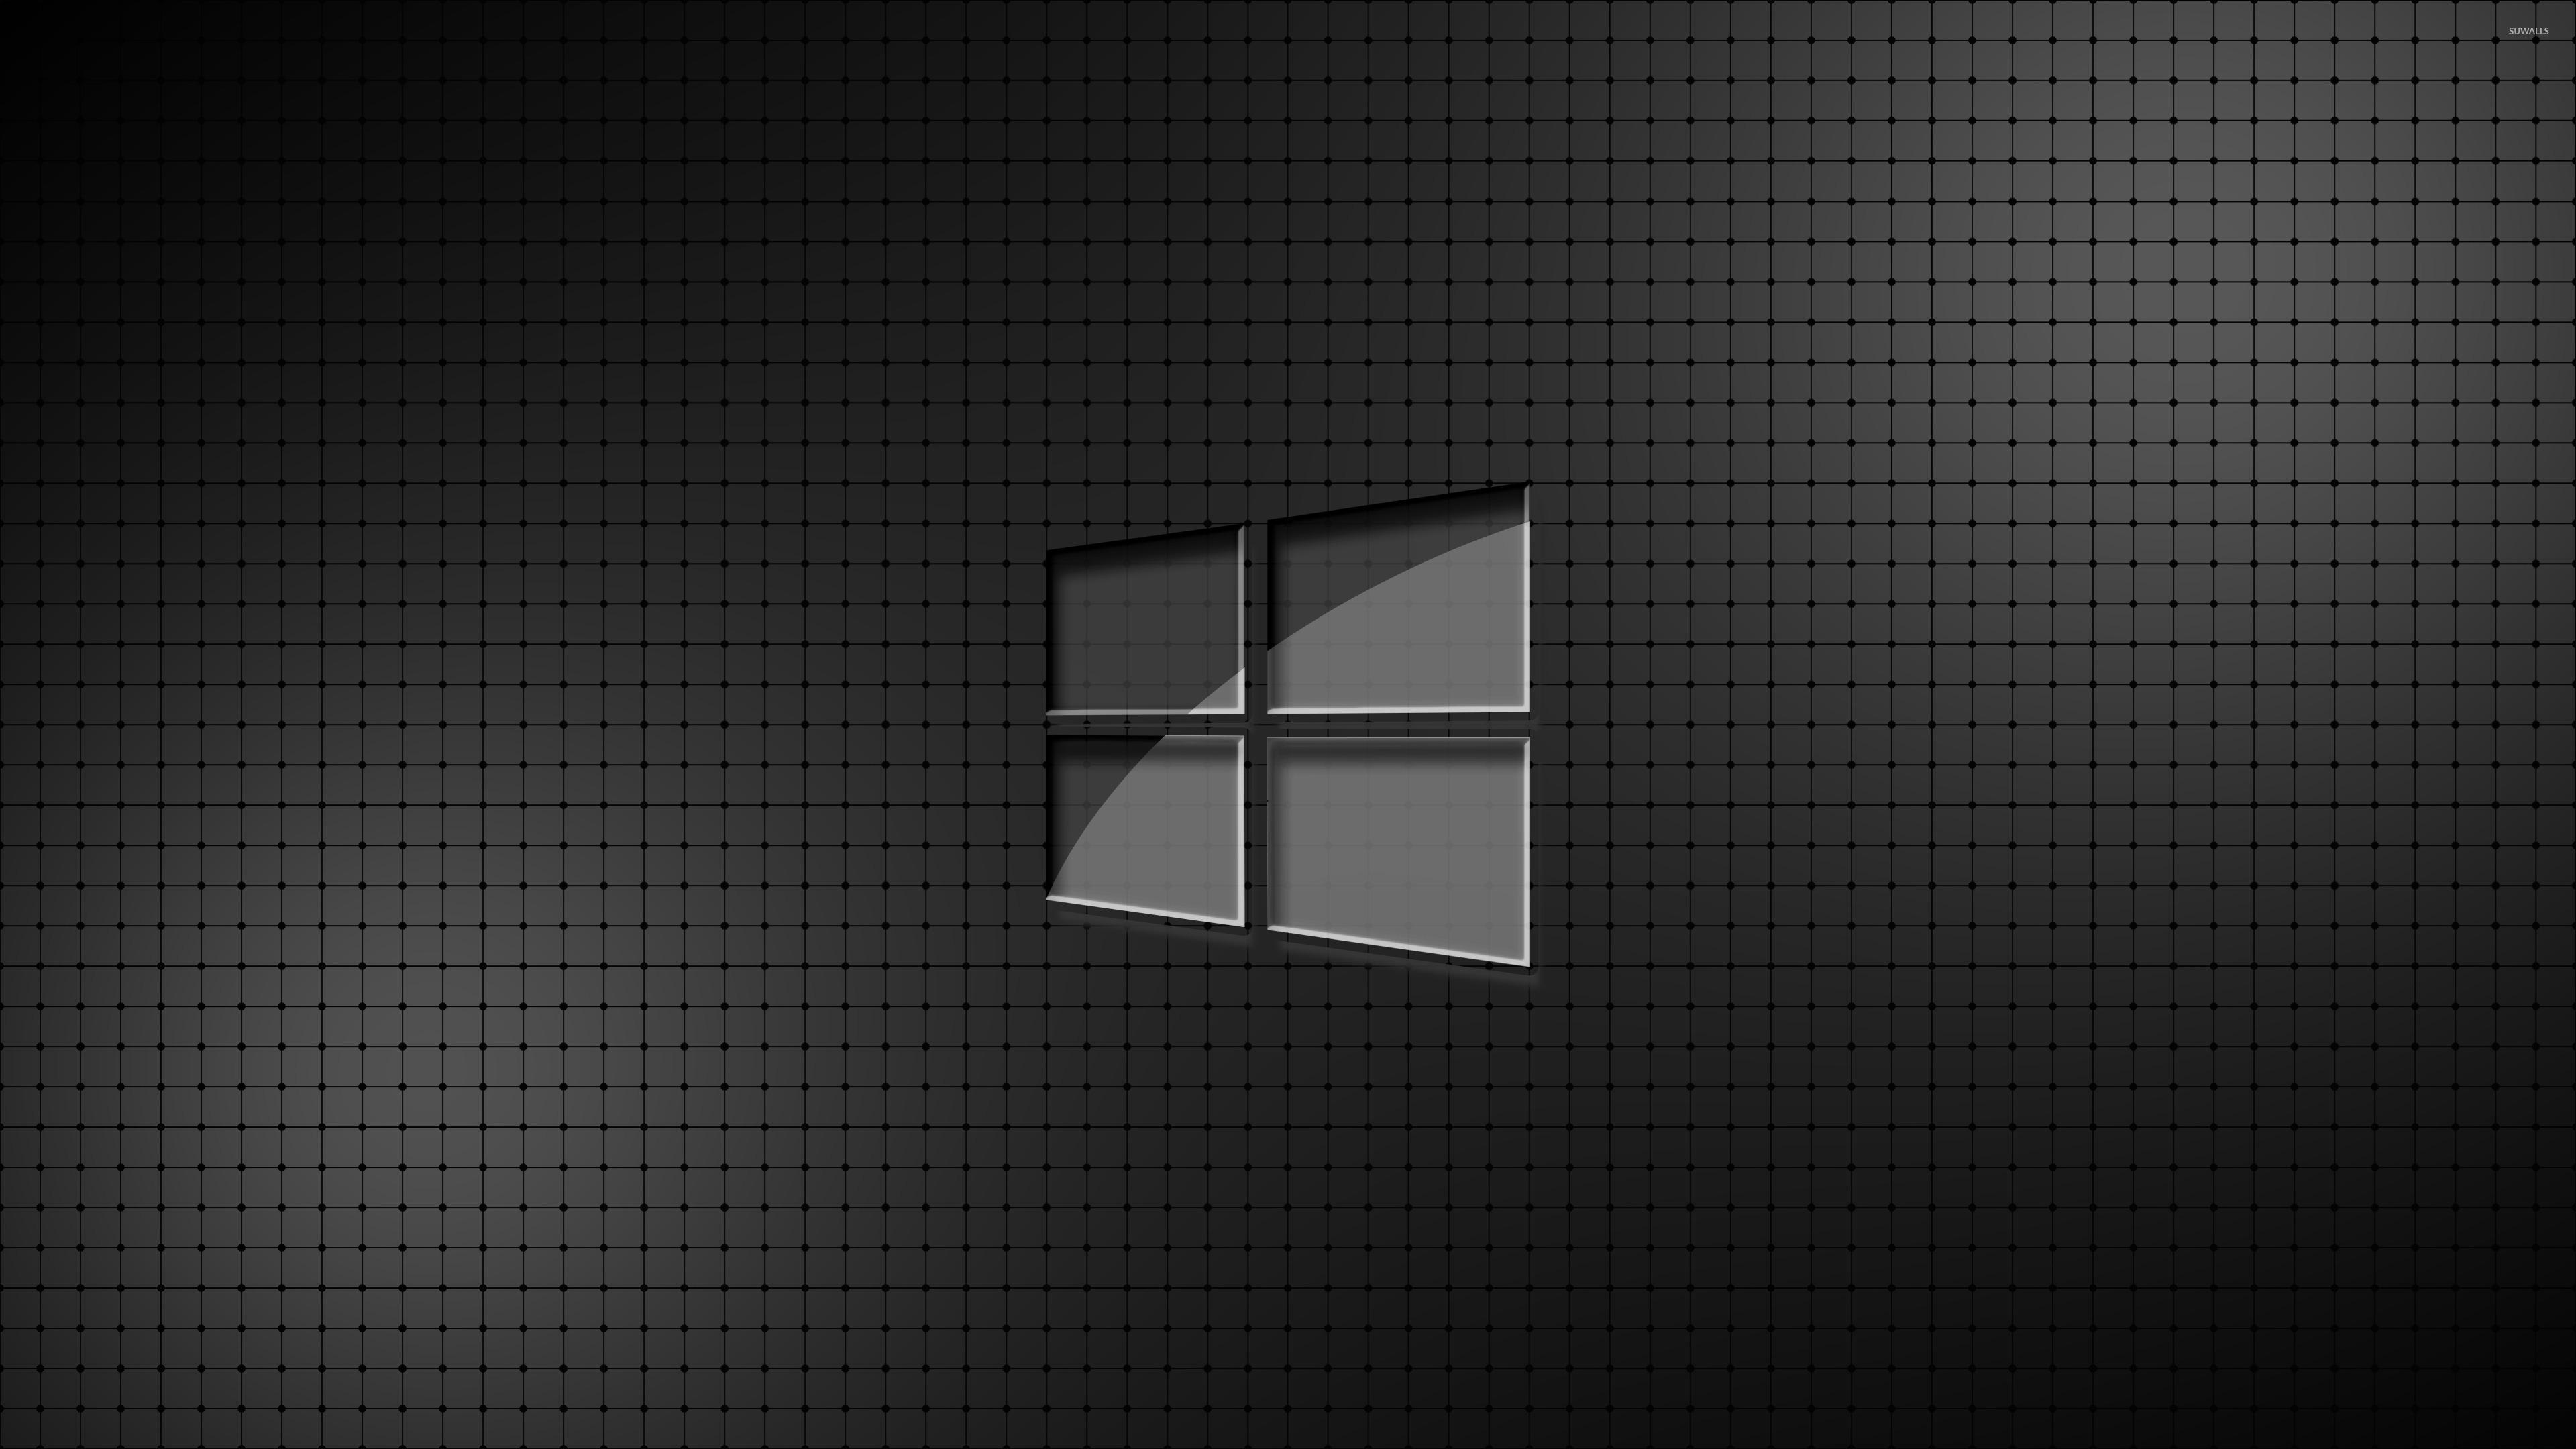 Glass Windows 10 Wallpaper : Glass windows on a grid wallpaper computer wallpapers